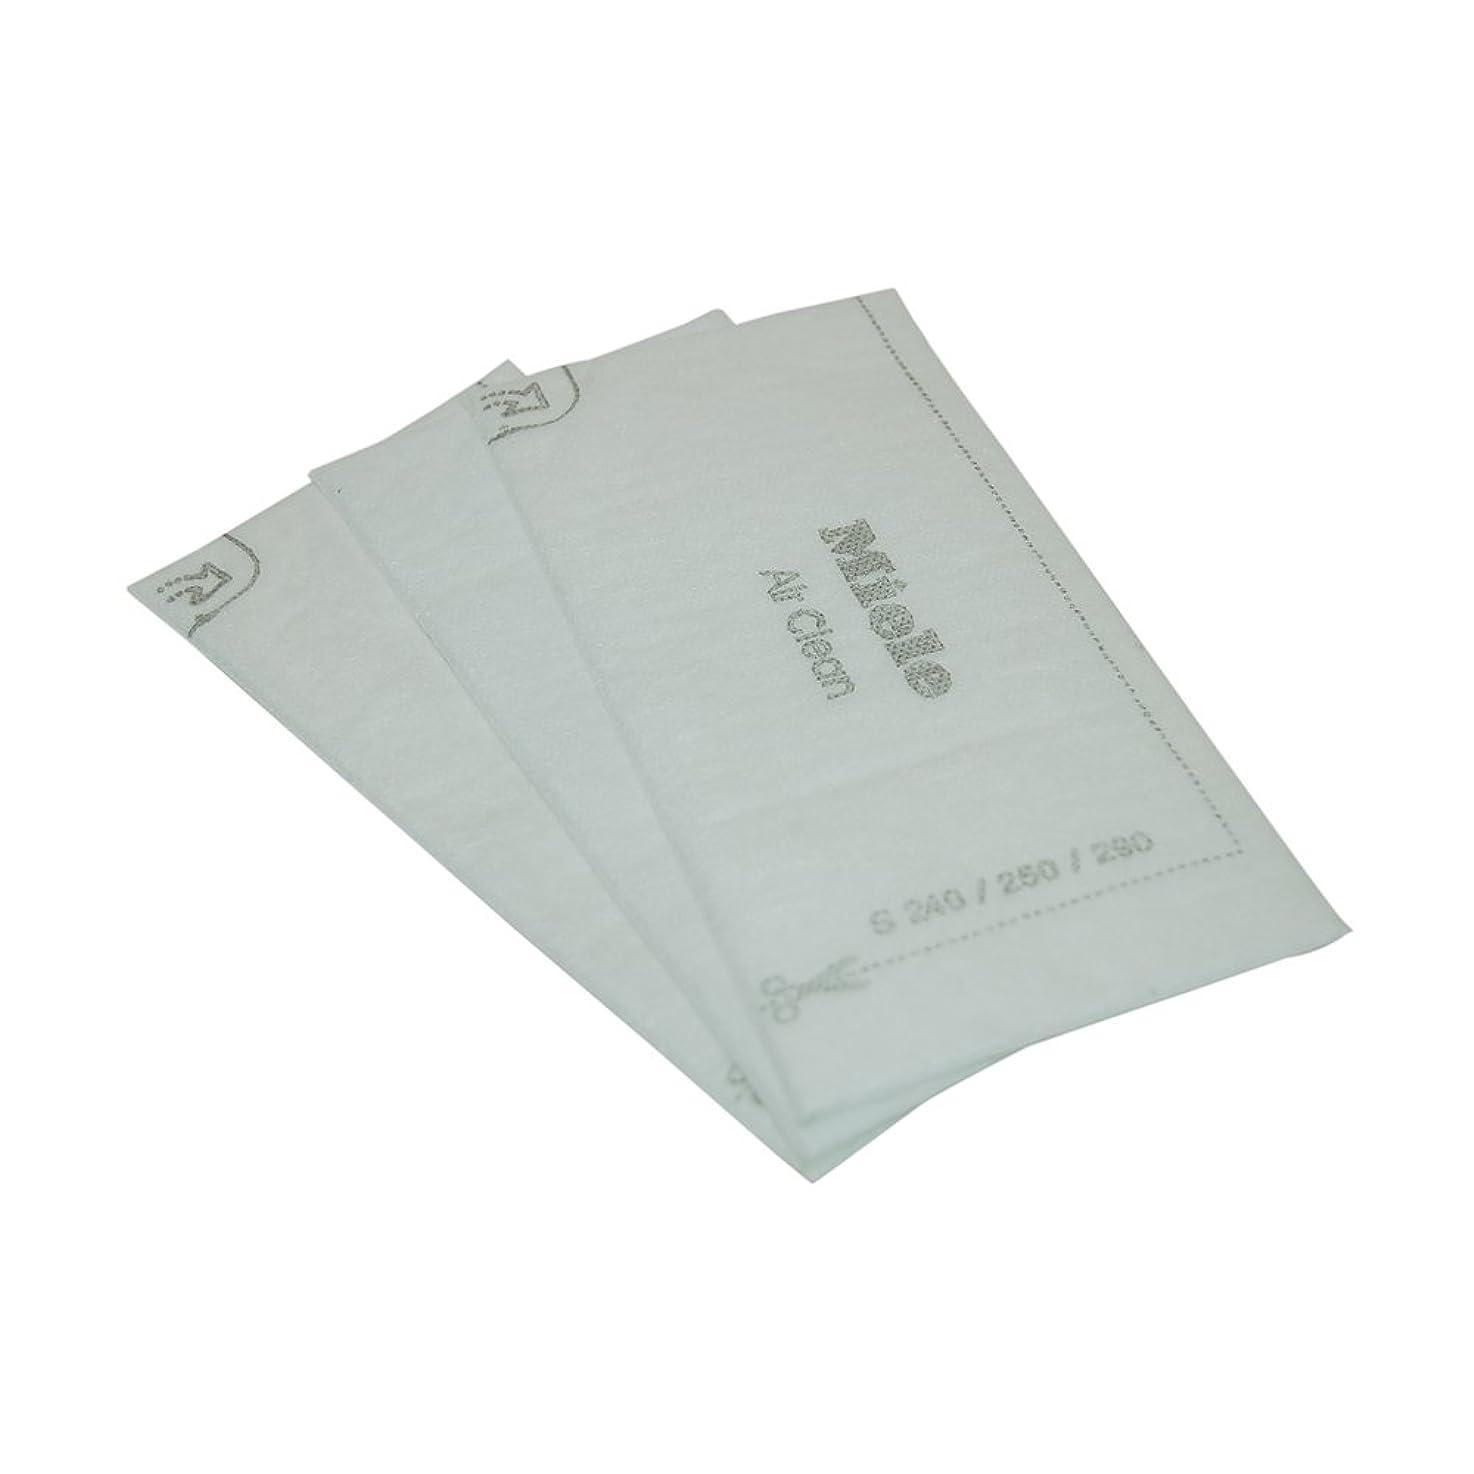 Genuine Miele Vacuum Cleaner Super Air Clean Filter 3944711